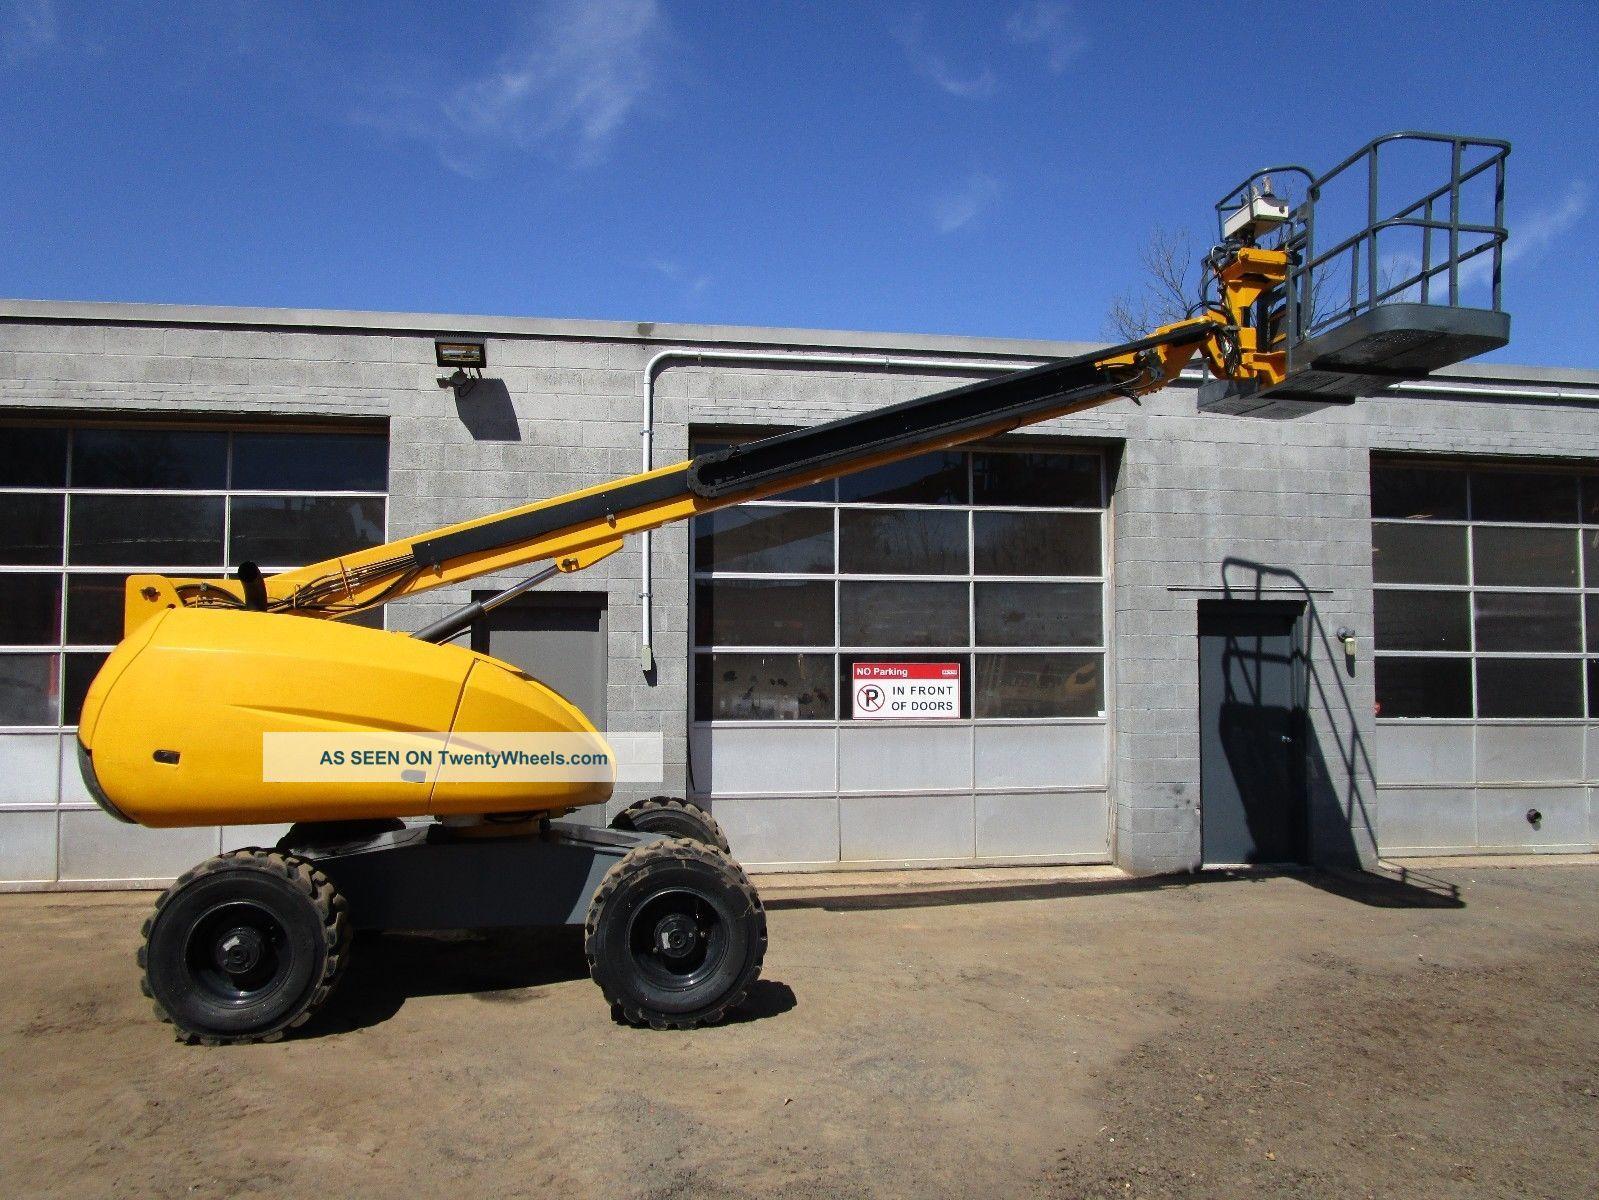 Single Man Lift 40 Ft : Haulotte hb ft telescopic diesel boom lift awp